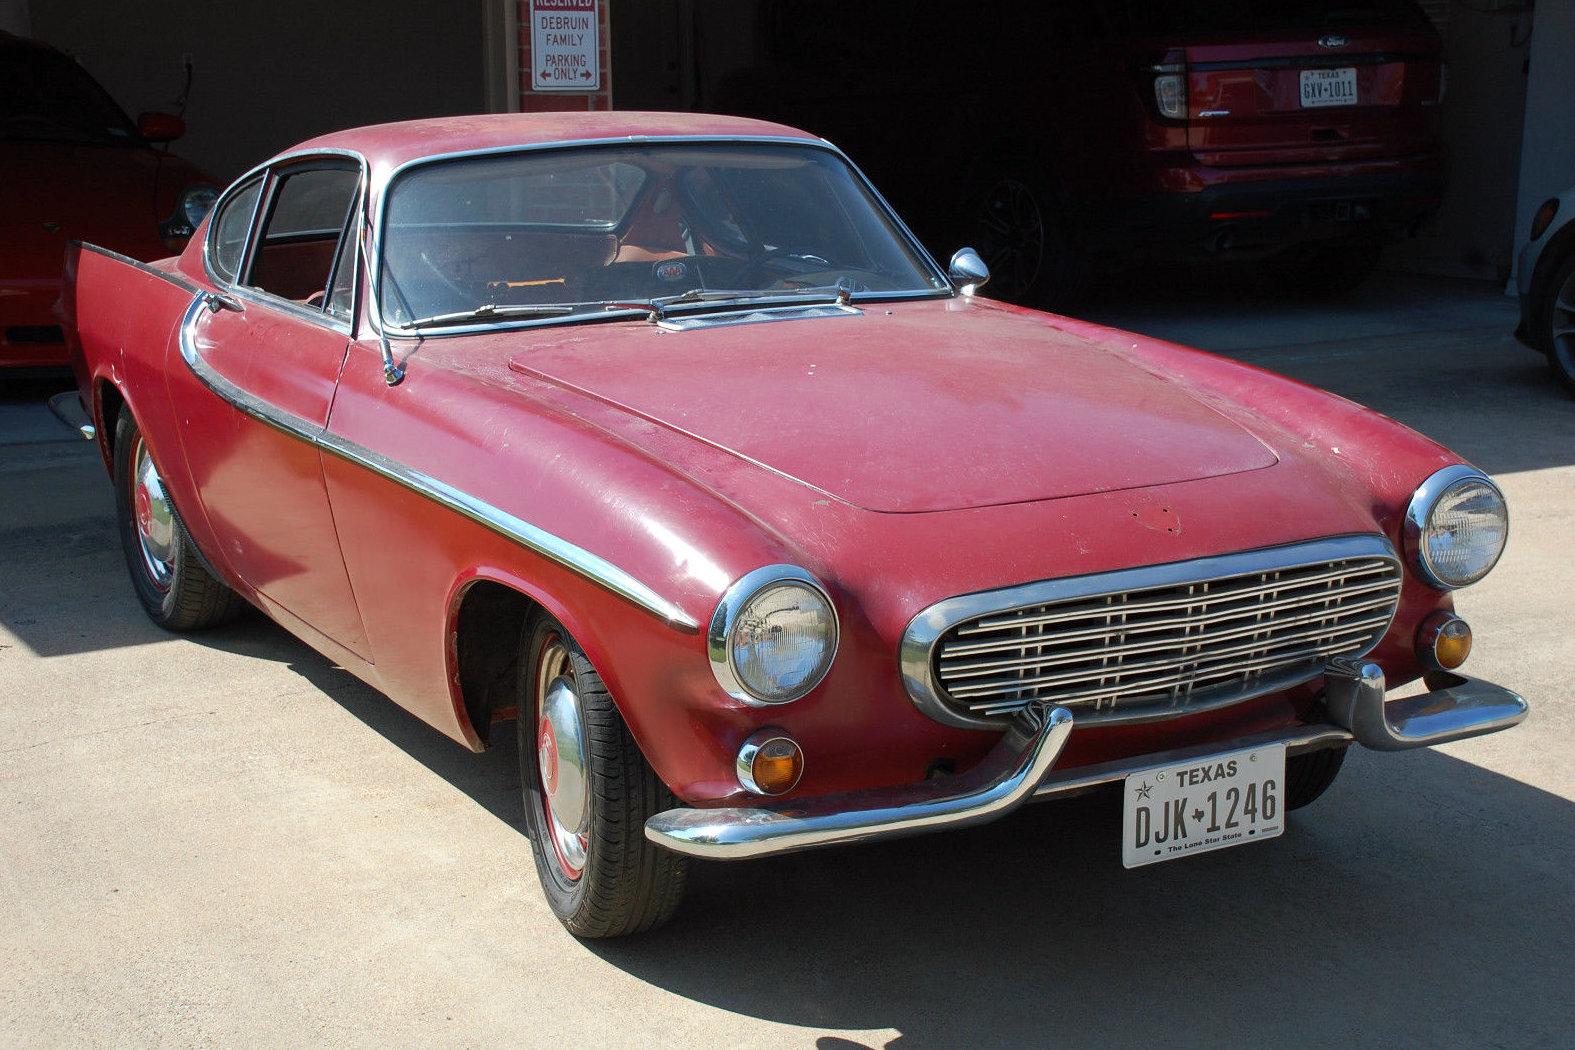 Volvo P1800 For Sale >> Flashback Find: 1964 Volvo P1800 S